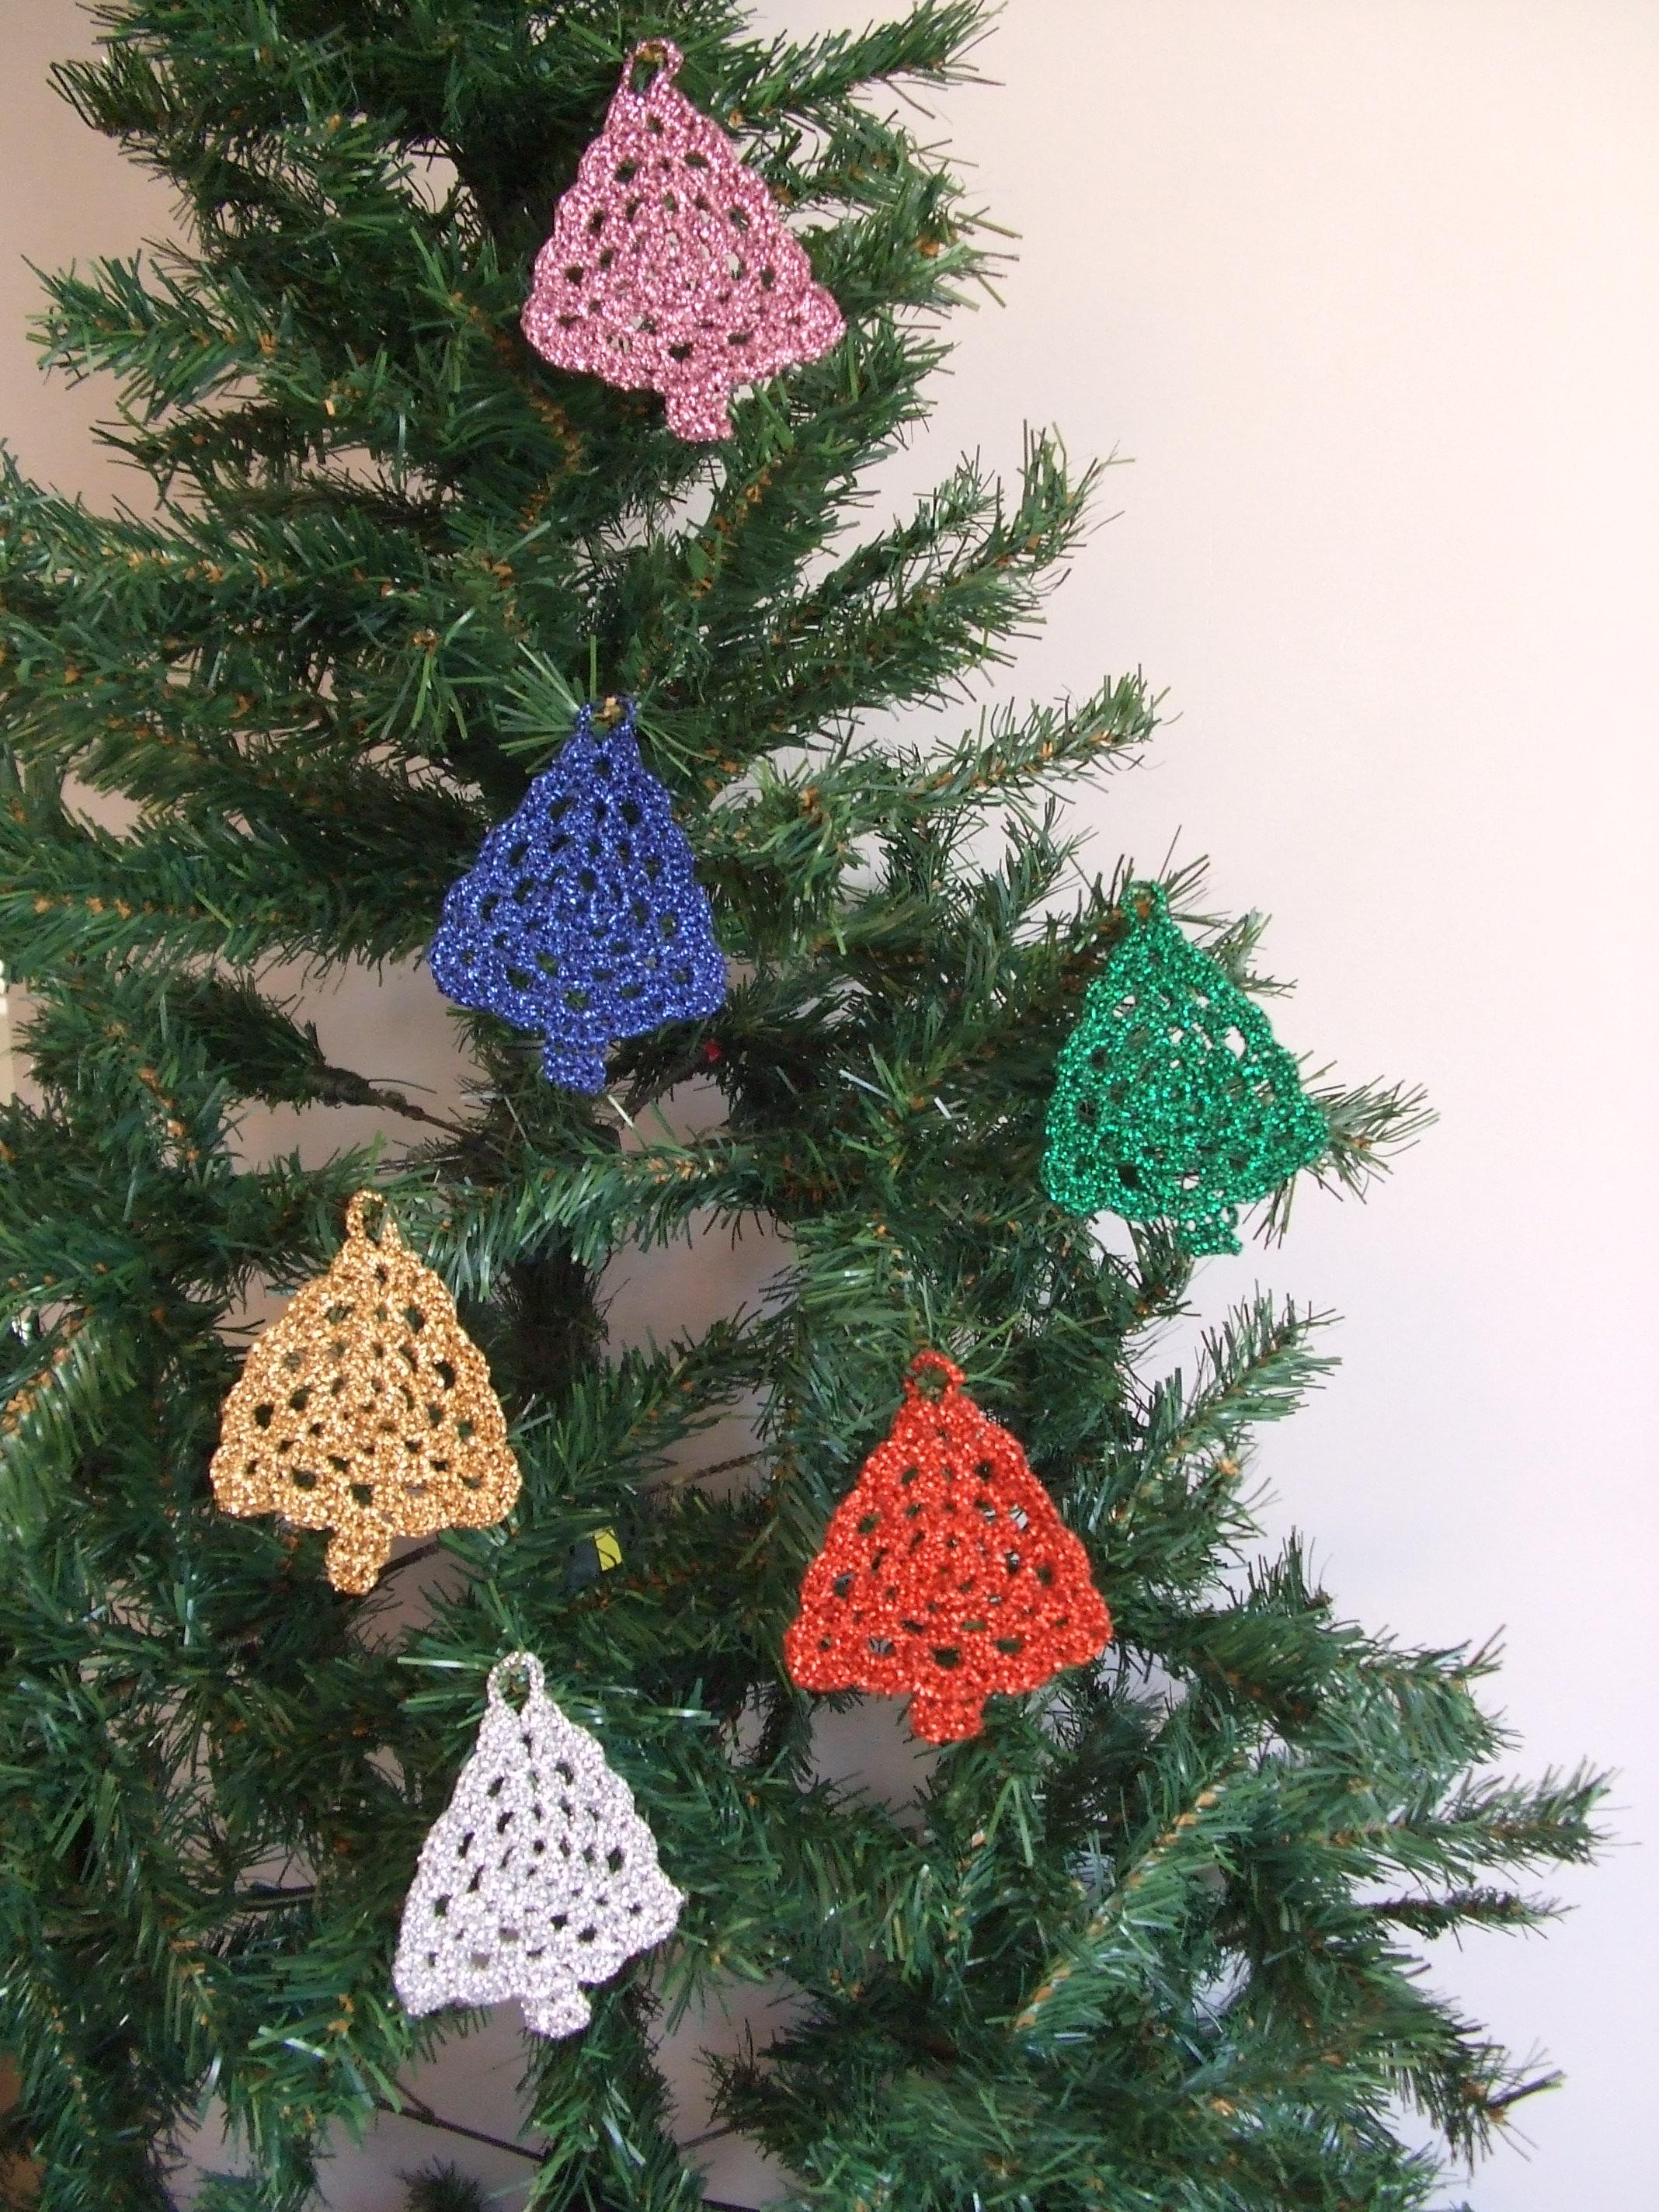 Crochet Christmas Tree.Set Of 5 Metallic Crocheted Christmas Tree Decorations Handmade Hanging Ornaments